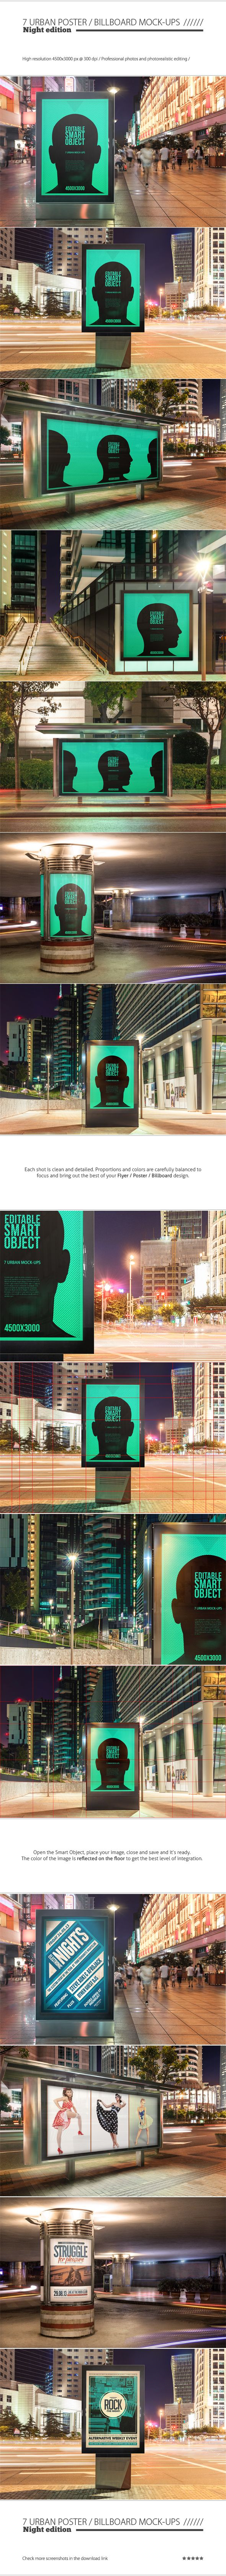 Urban Flyer / Poster / Billboard MockUp - Night Edition by Nuwan Panditha, via…